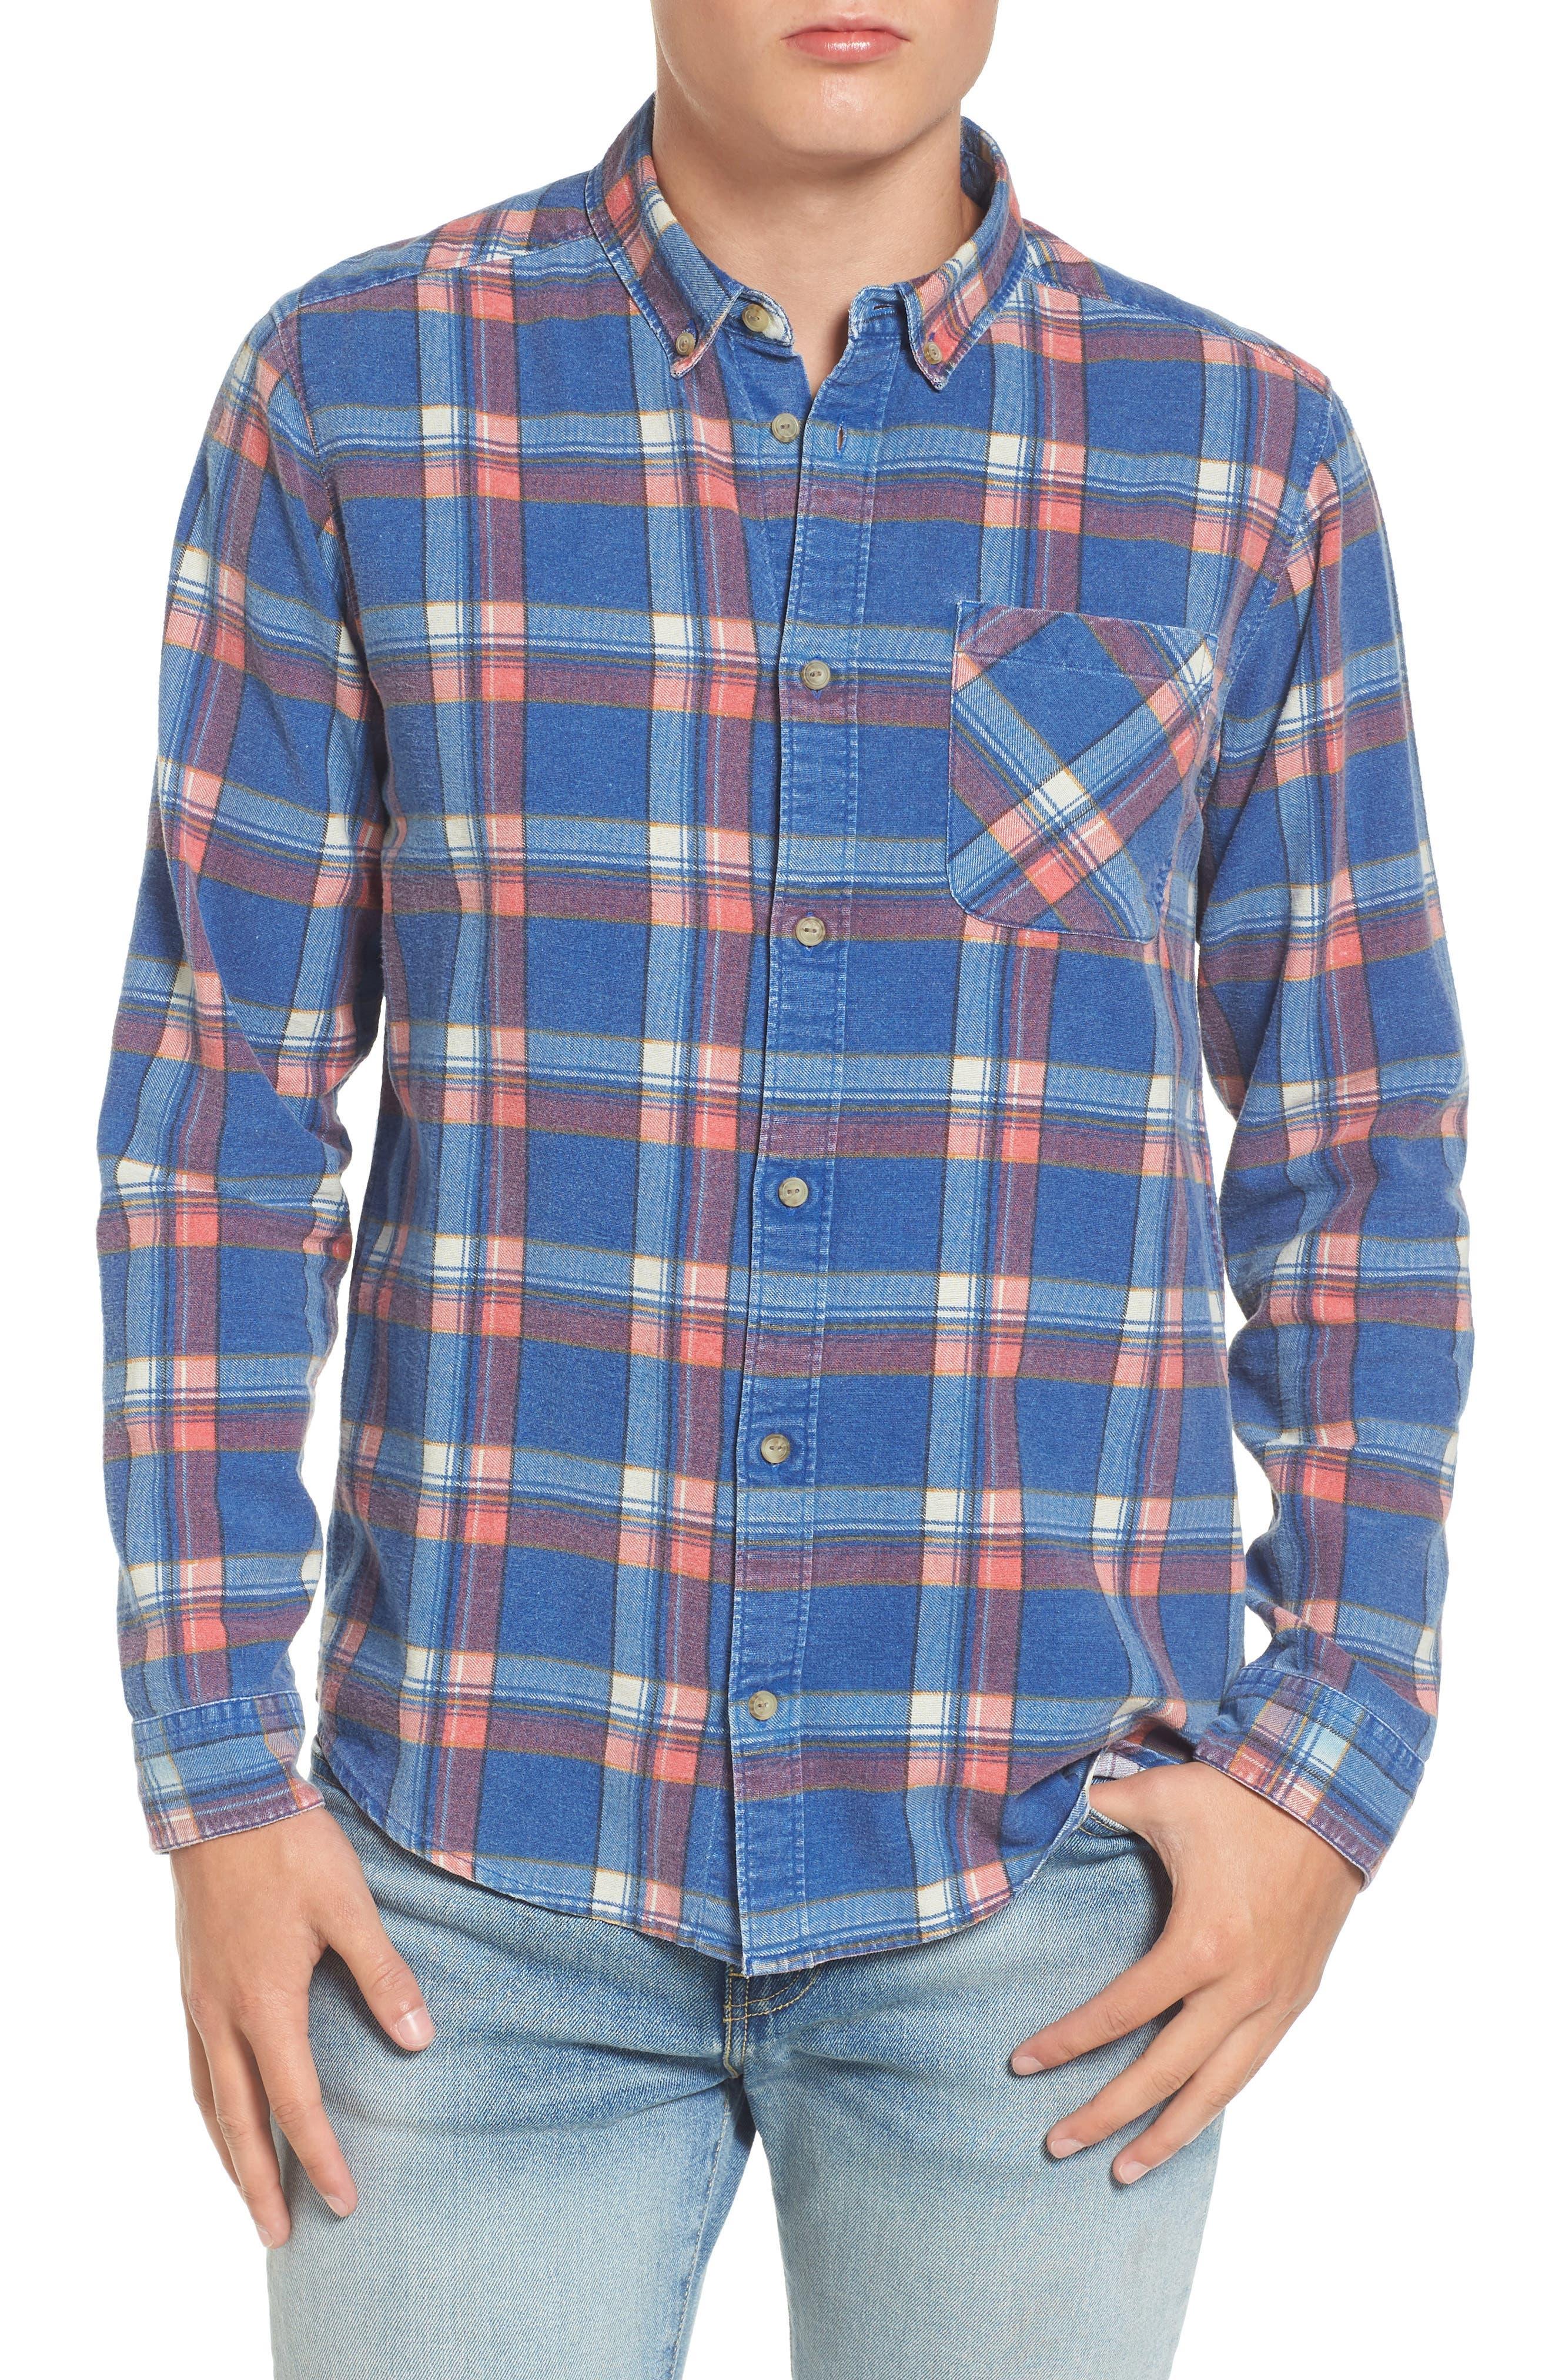 Alternate Image 1 Selected - RVCA x Kevin Long Plaid Shirt